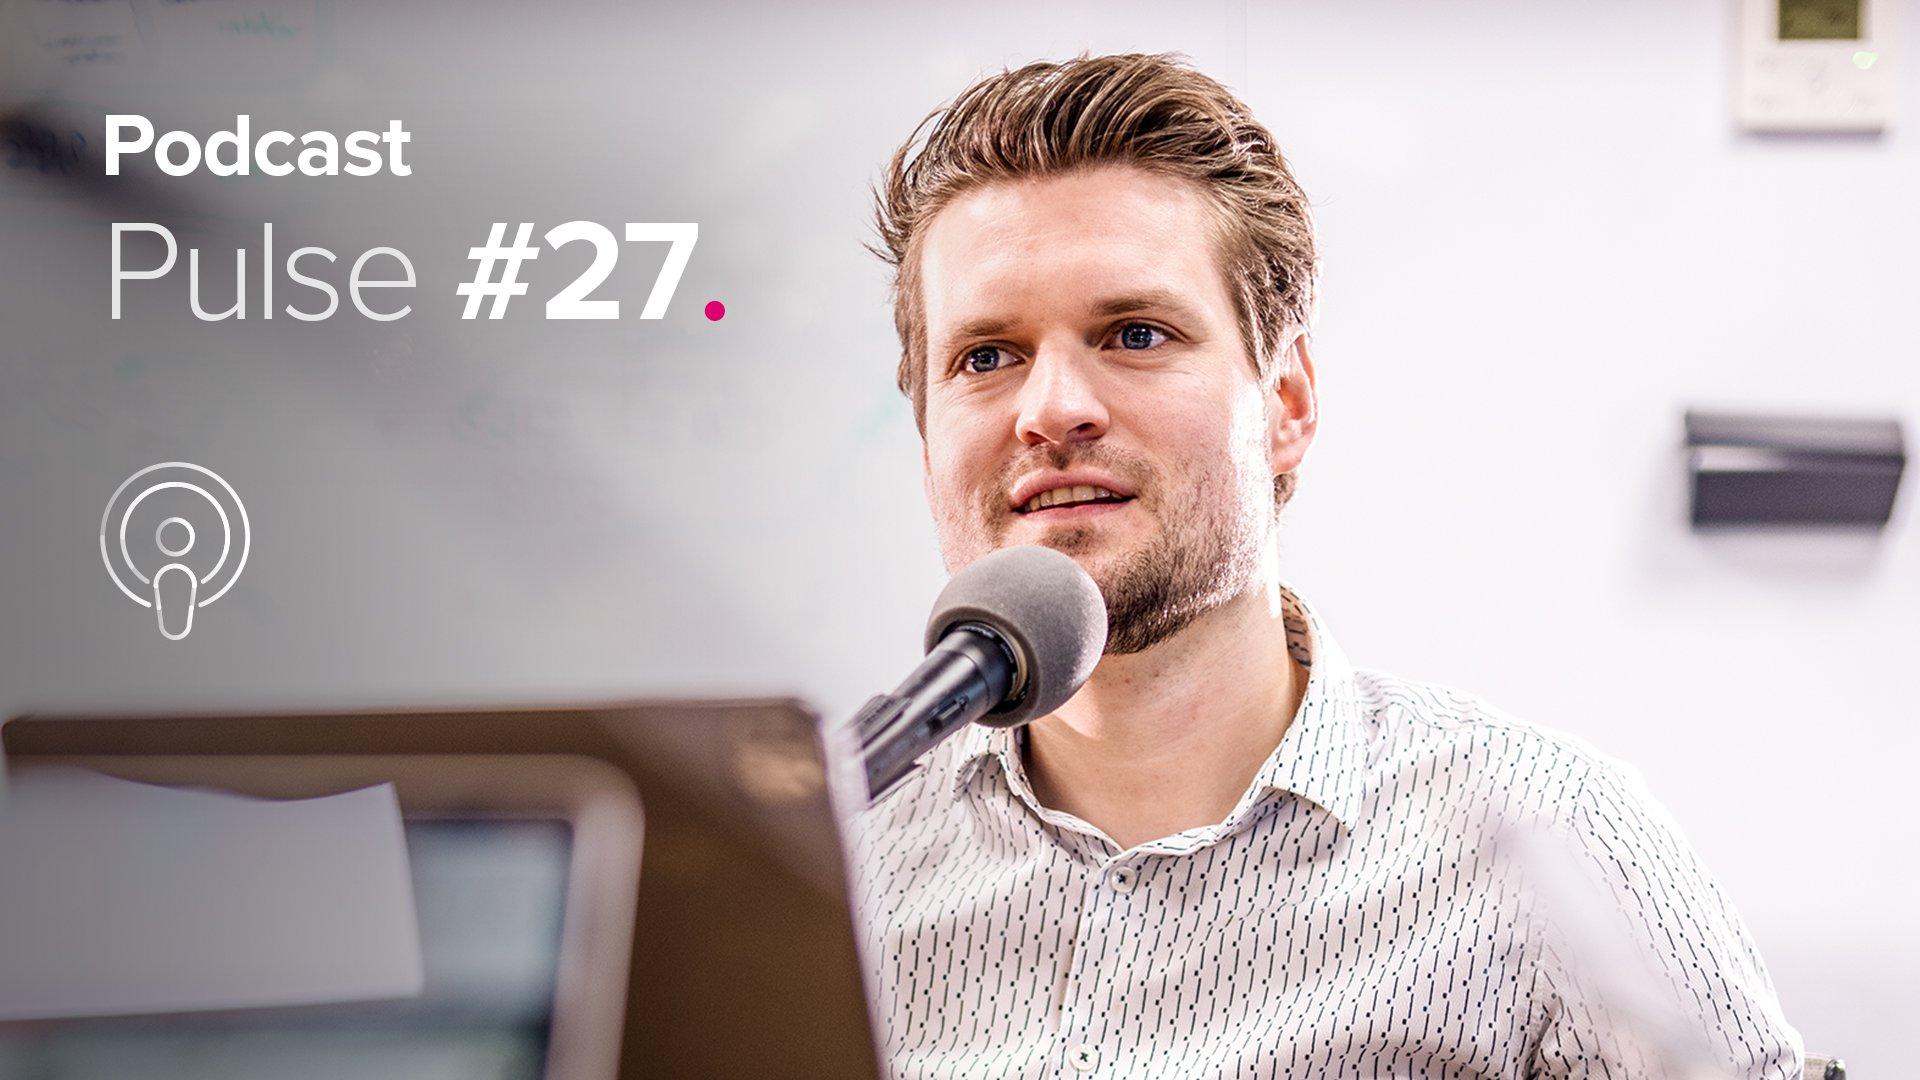 Podcast Digital Brains Pulse #27